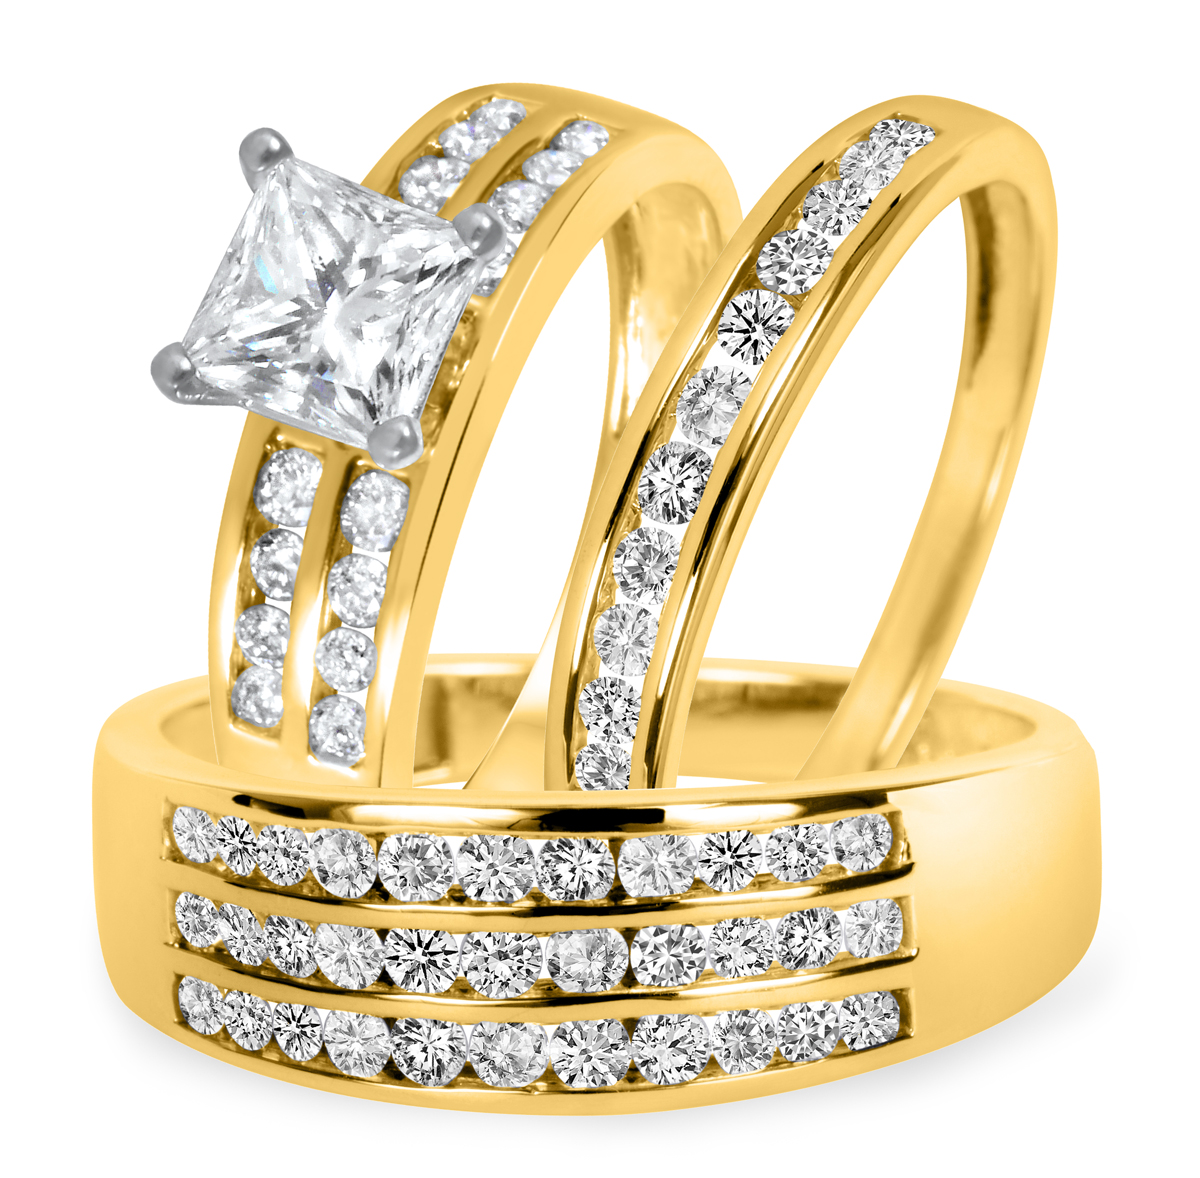 2 1/5 CT. T.W. Diamond Ladies Engagement Ring, Wedding Band, Men's Wedding Band